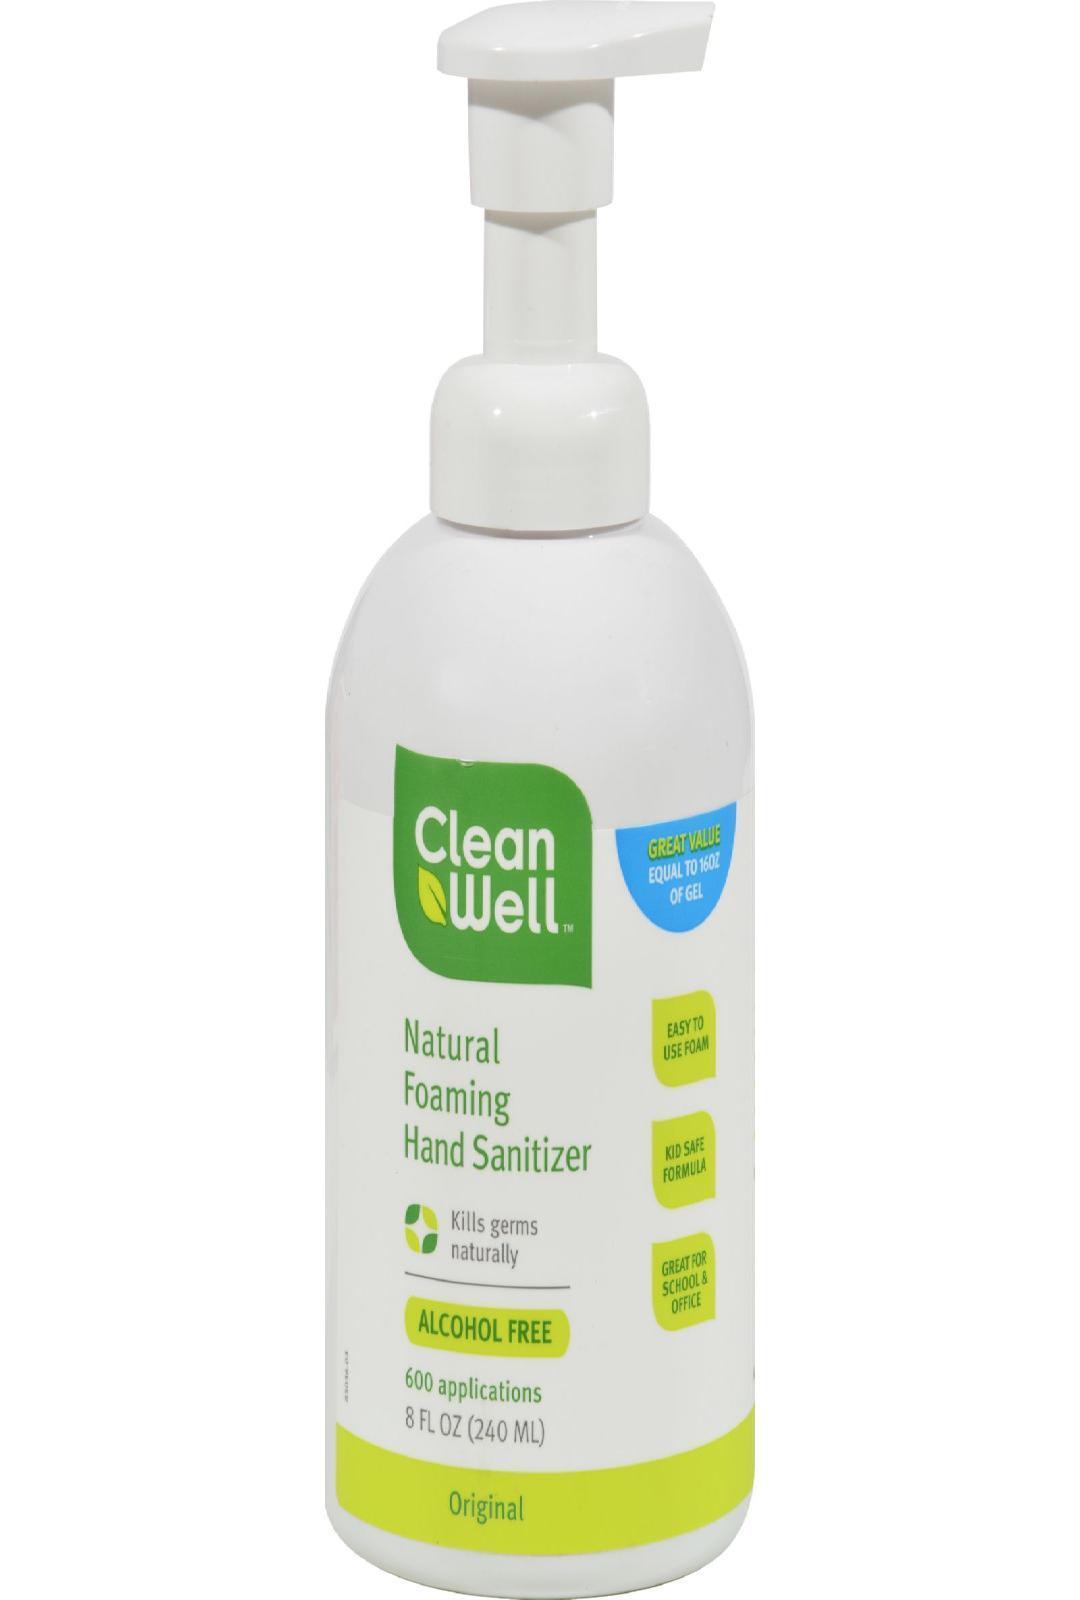 Cleanwell Hand Sanitizing Foam 8 Oz Hand Sanitizer Alcohol